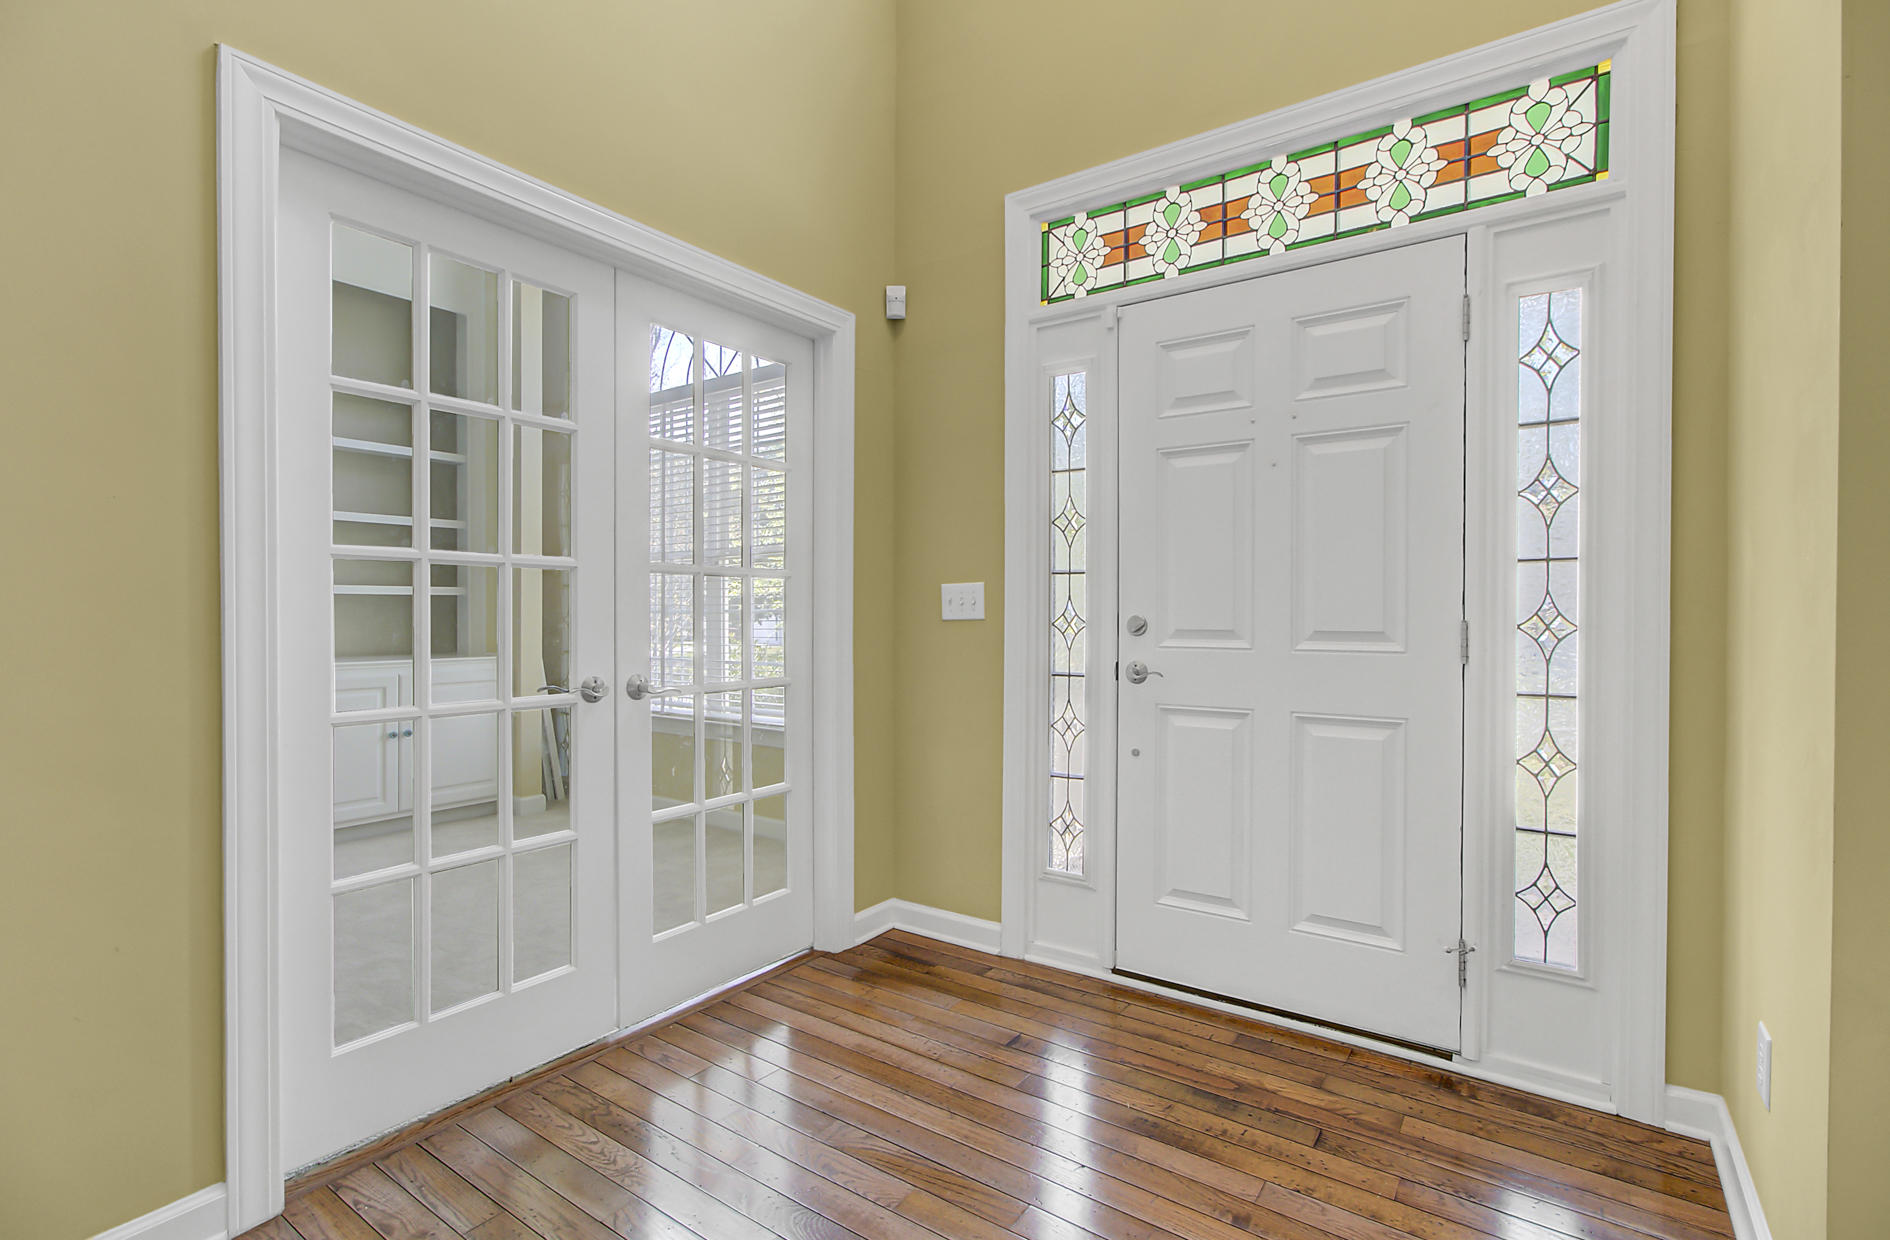 Marsh Cove Homes For Sale - 2928 Riverwood, Mount Pleasant, SC - 20